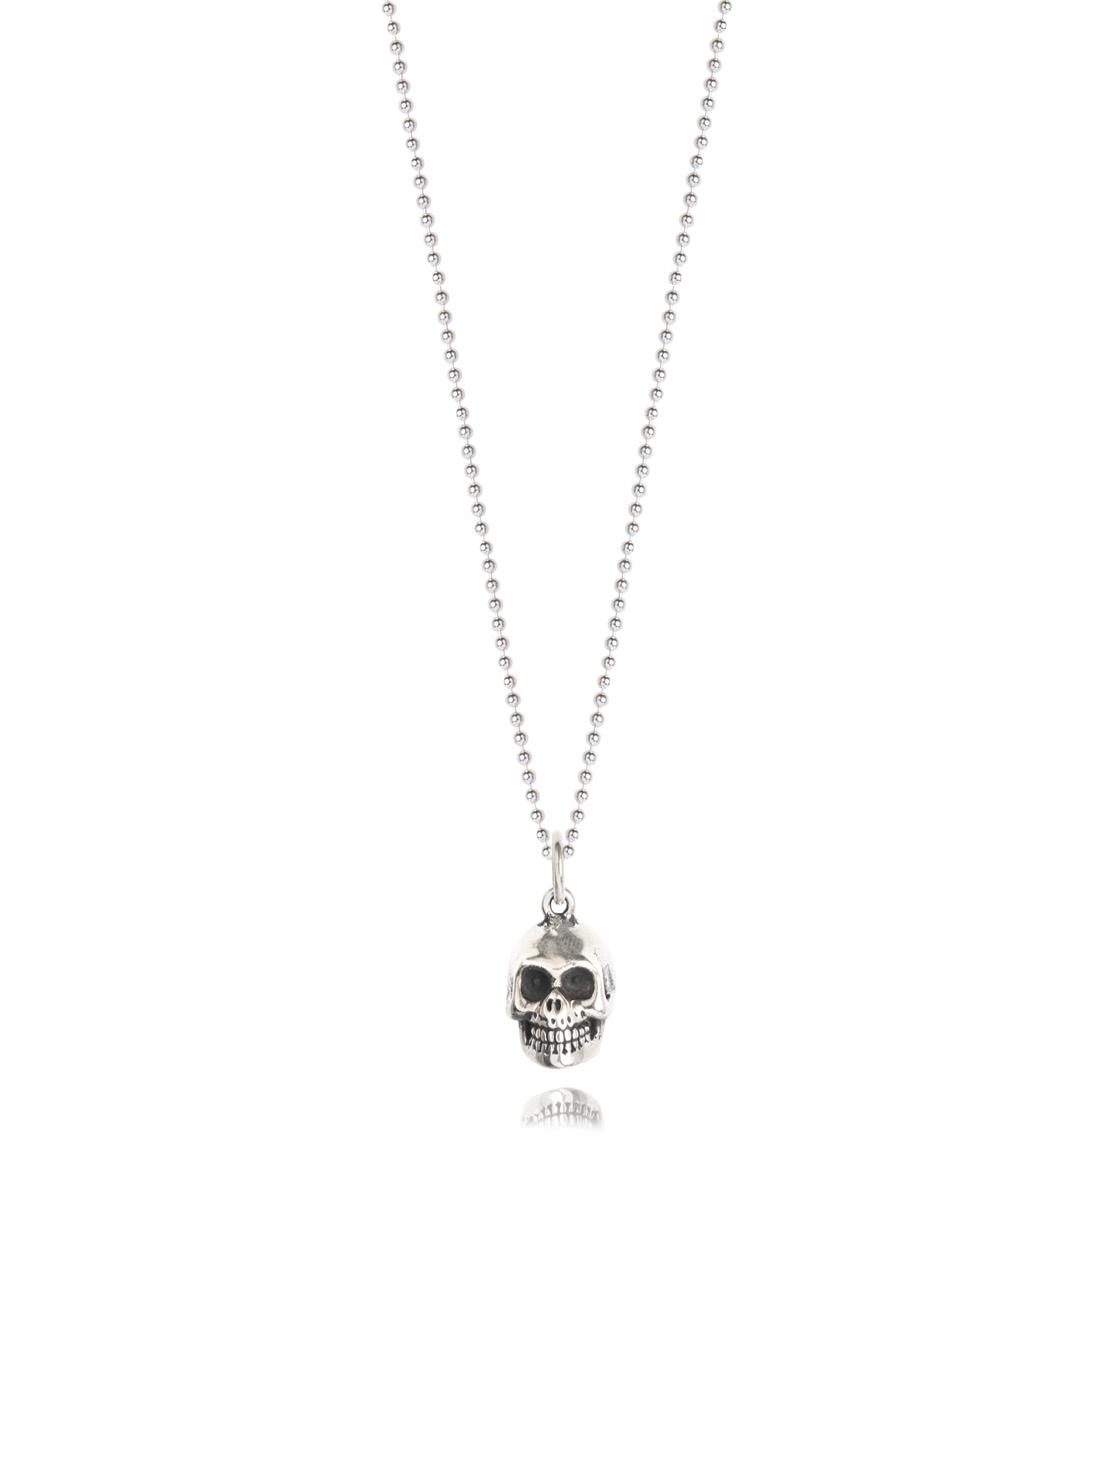 34134ad32d0 Silver Skull Necklace - Tilly Sveaas Jewellery